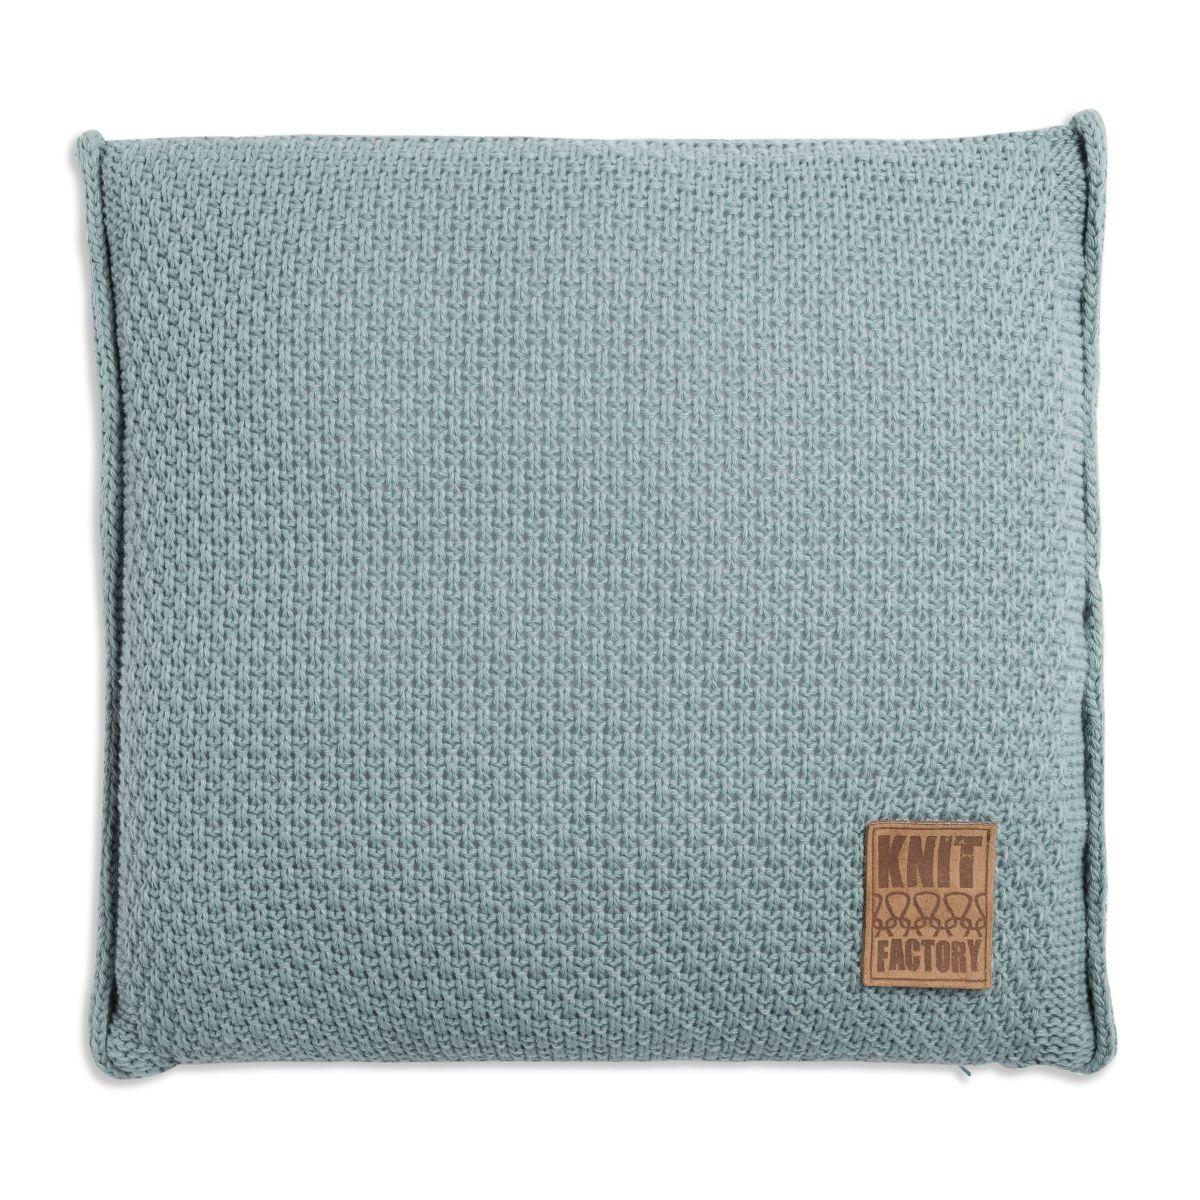 jesse cushion stone green 50x50